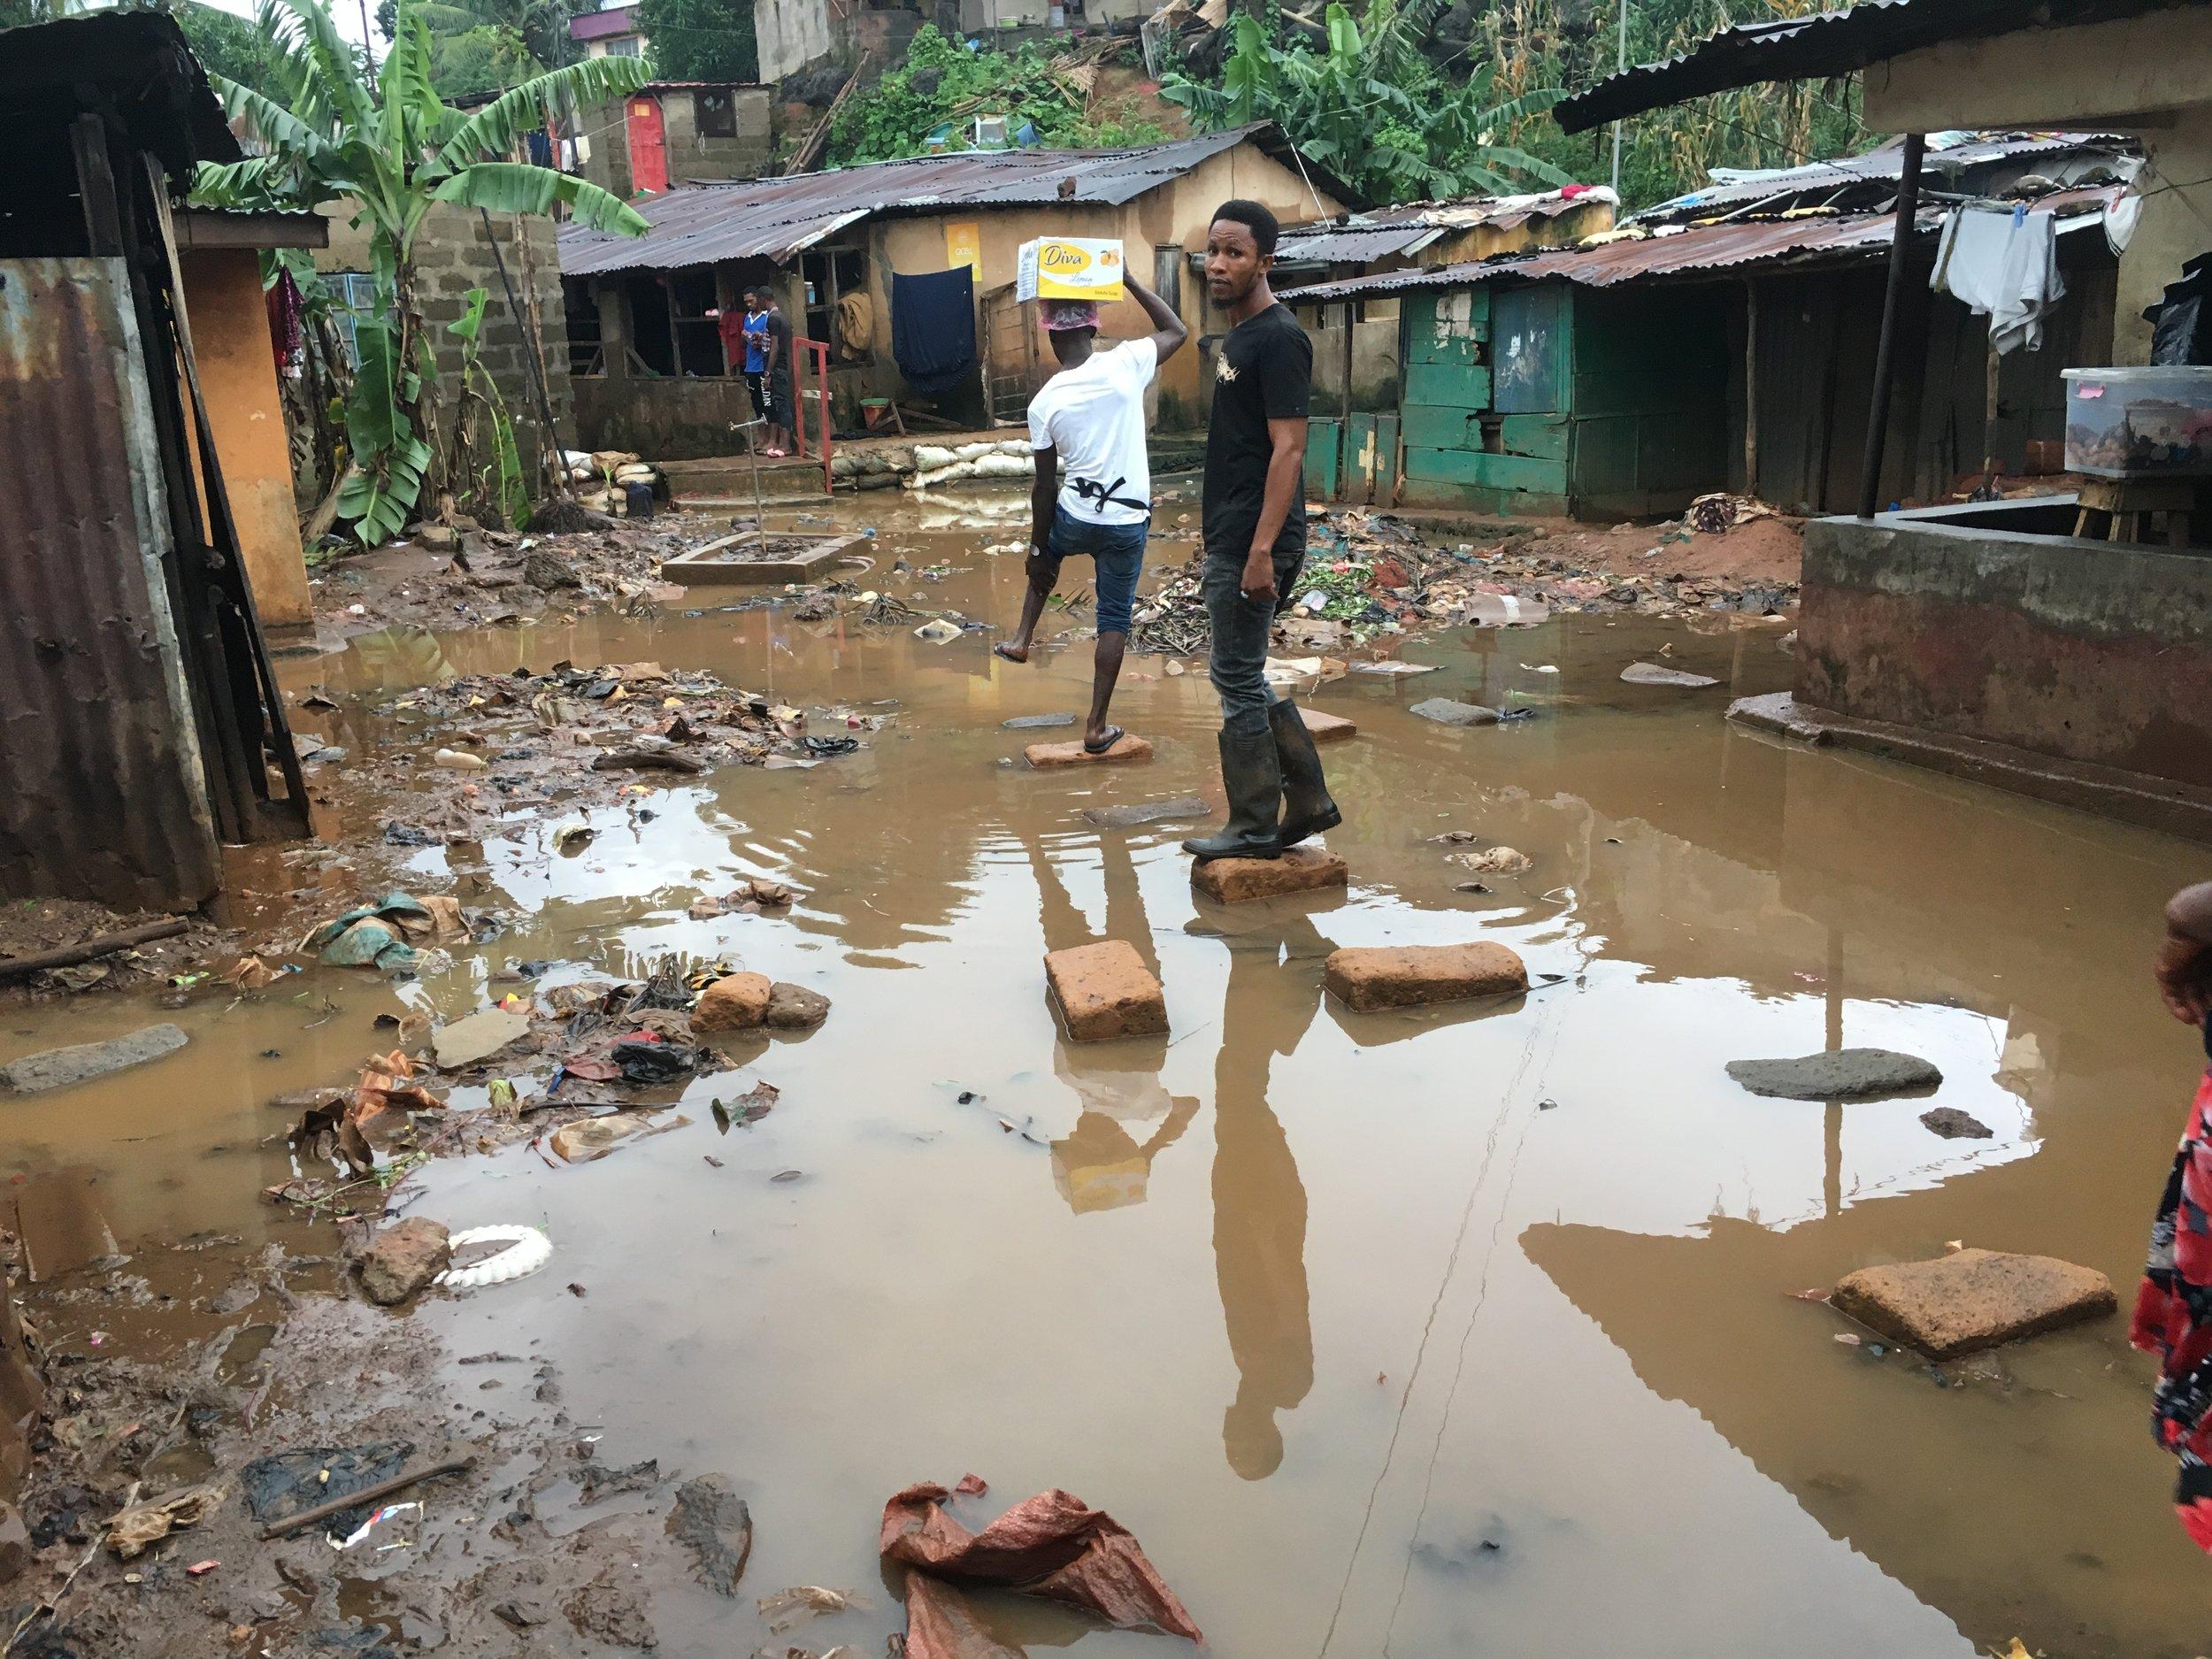 Joseph standing in Culvert community, Freetown